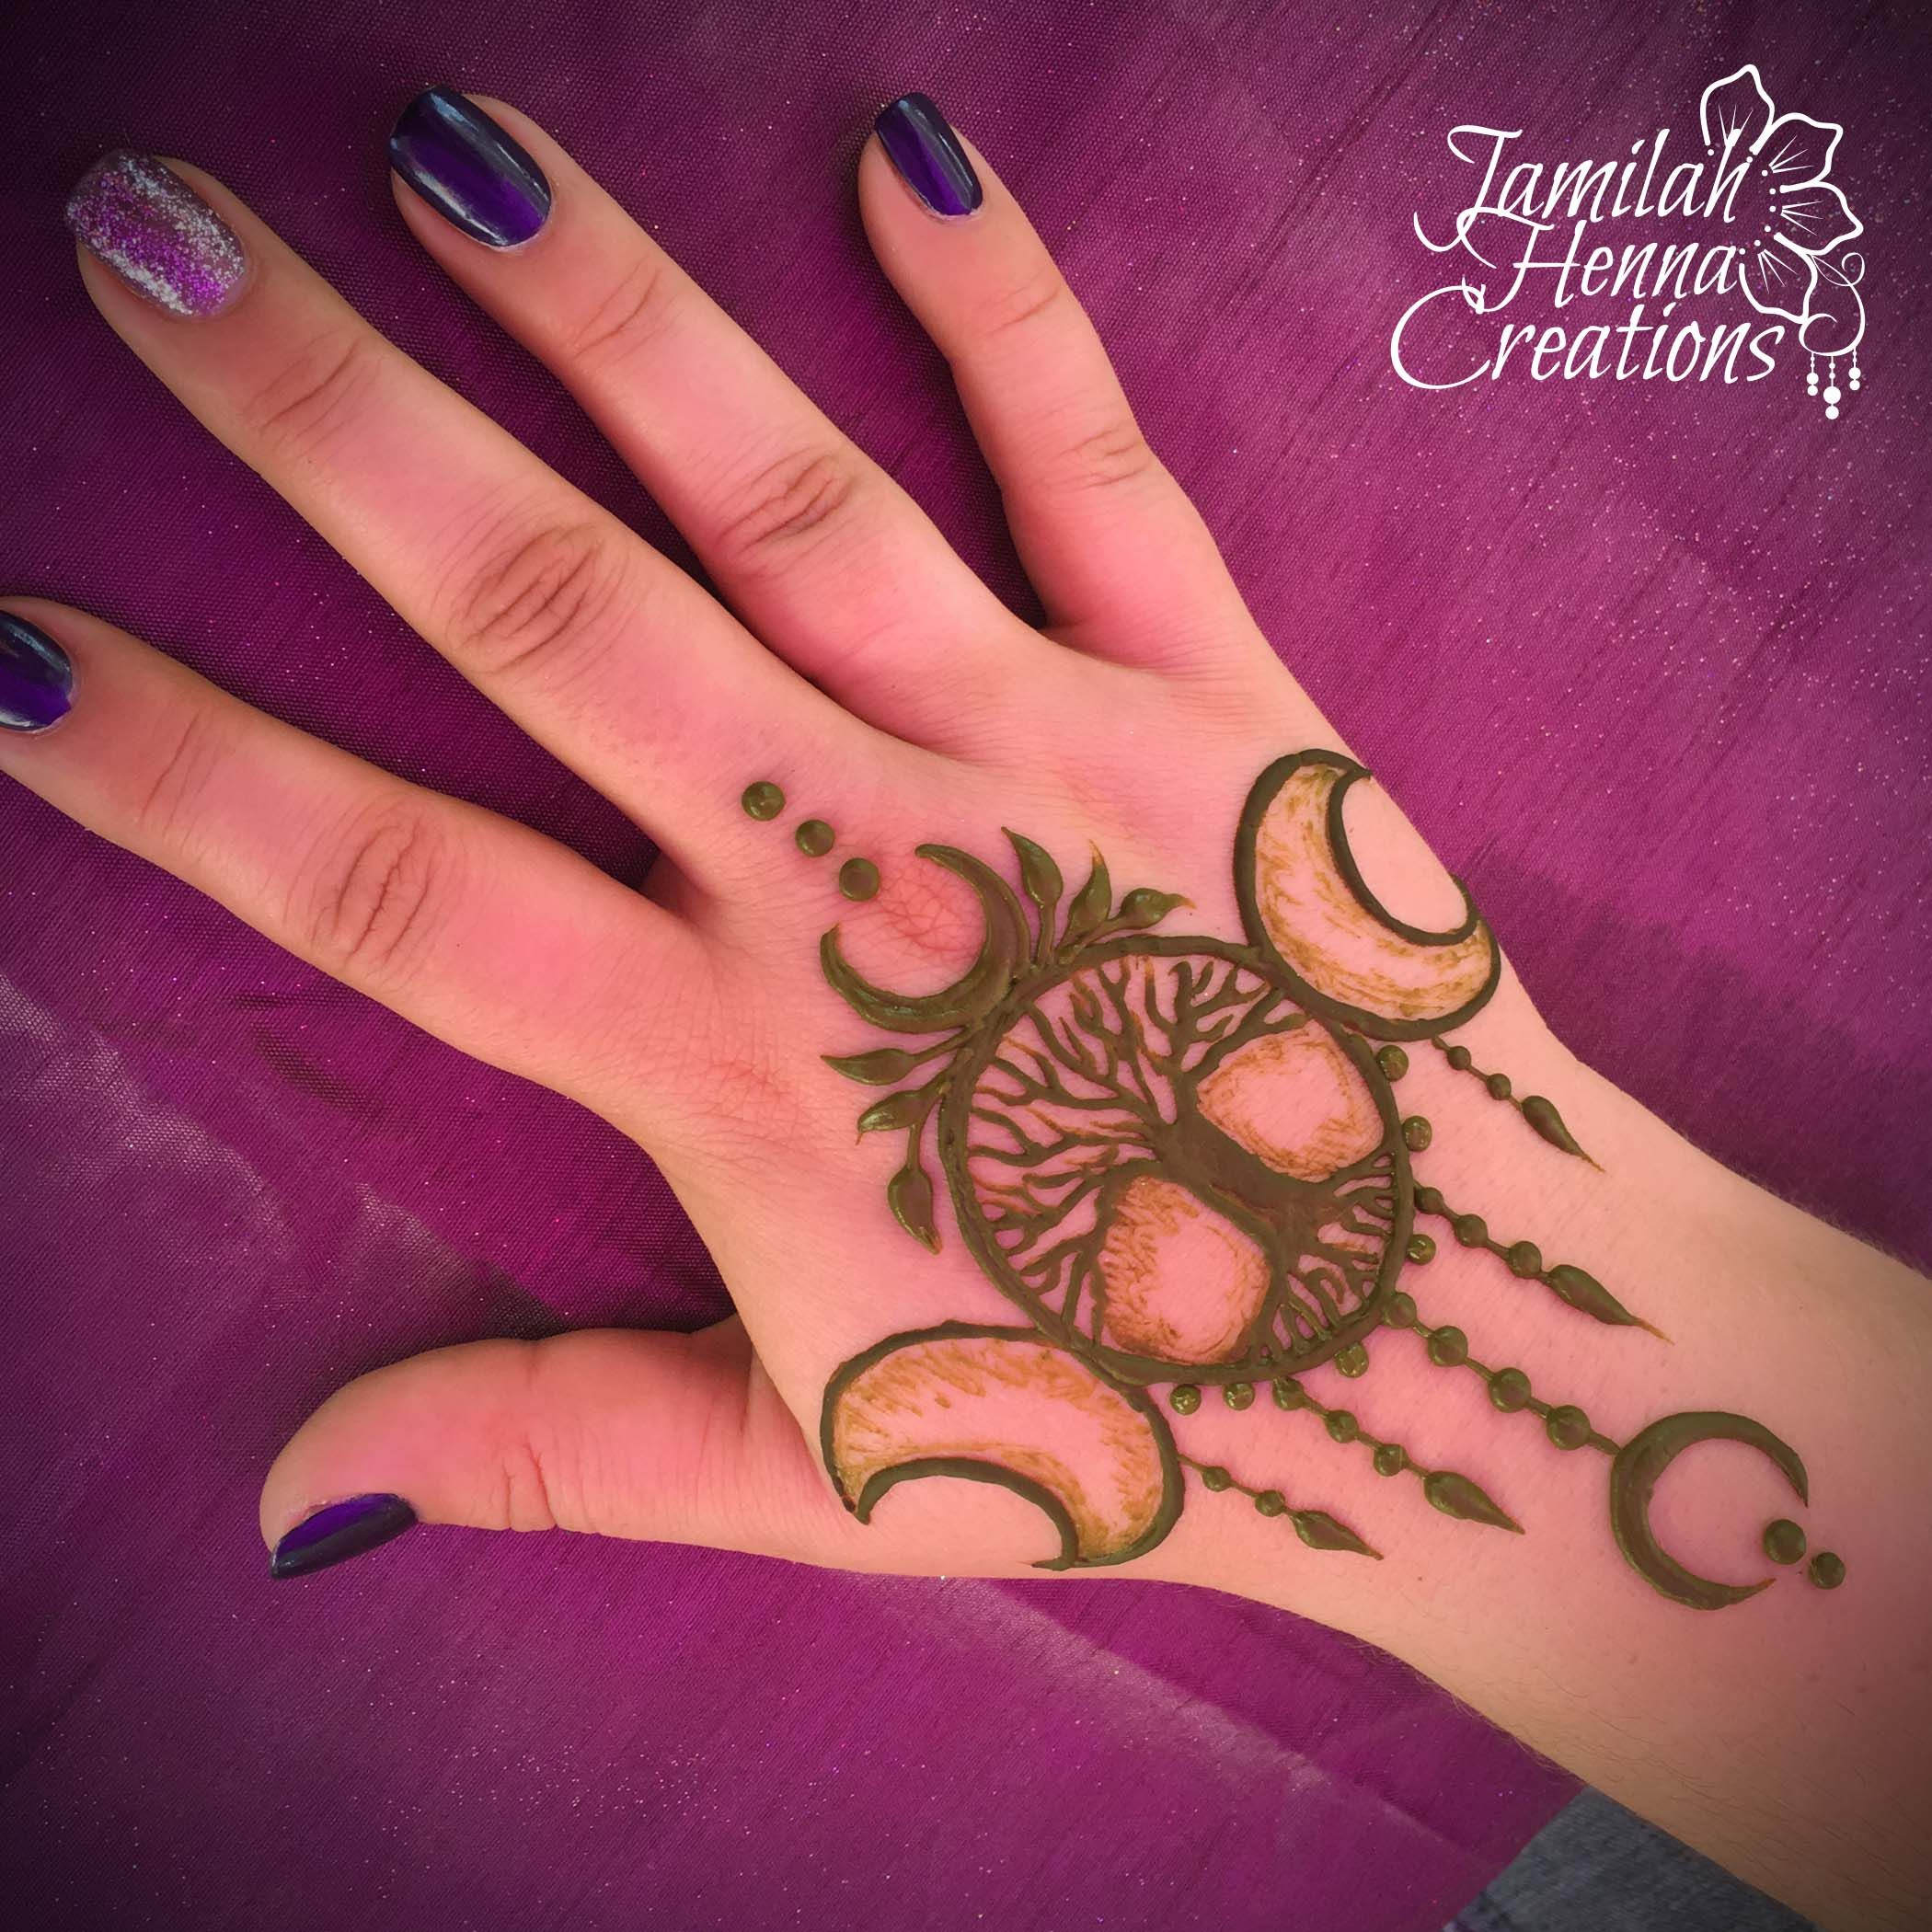 Inflicting Ink Tattoo Henna Themed Tattoos: Tree Of Life Moon Henna Design Www.jamilahhennacreations